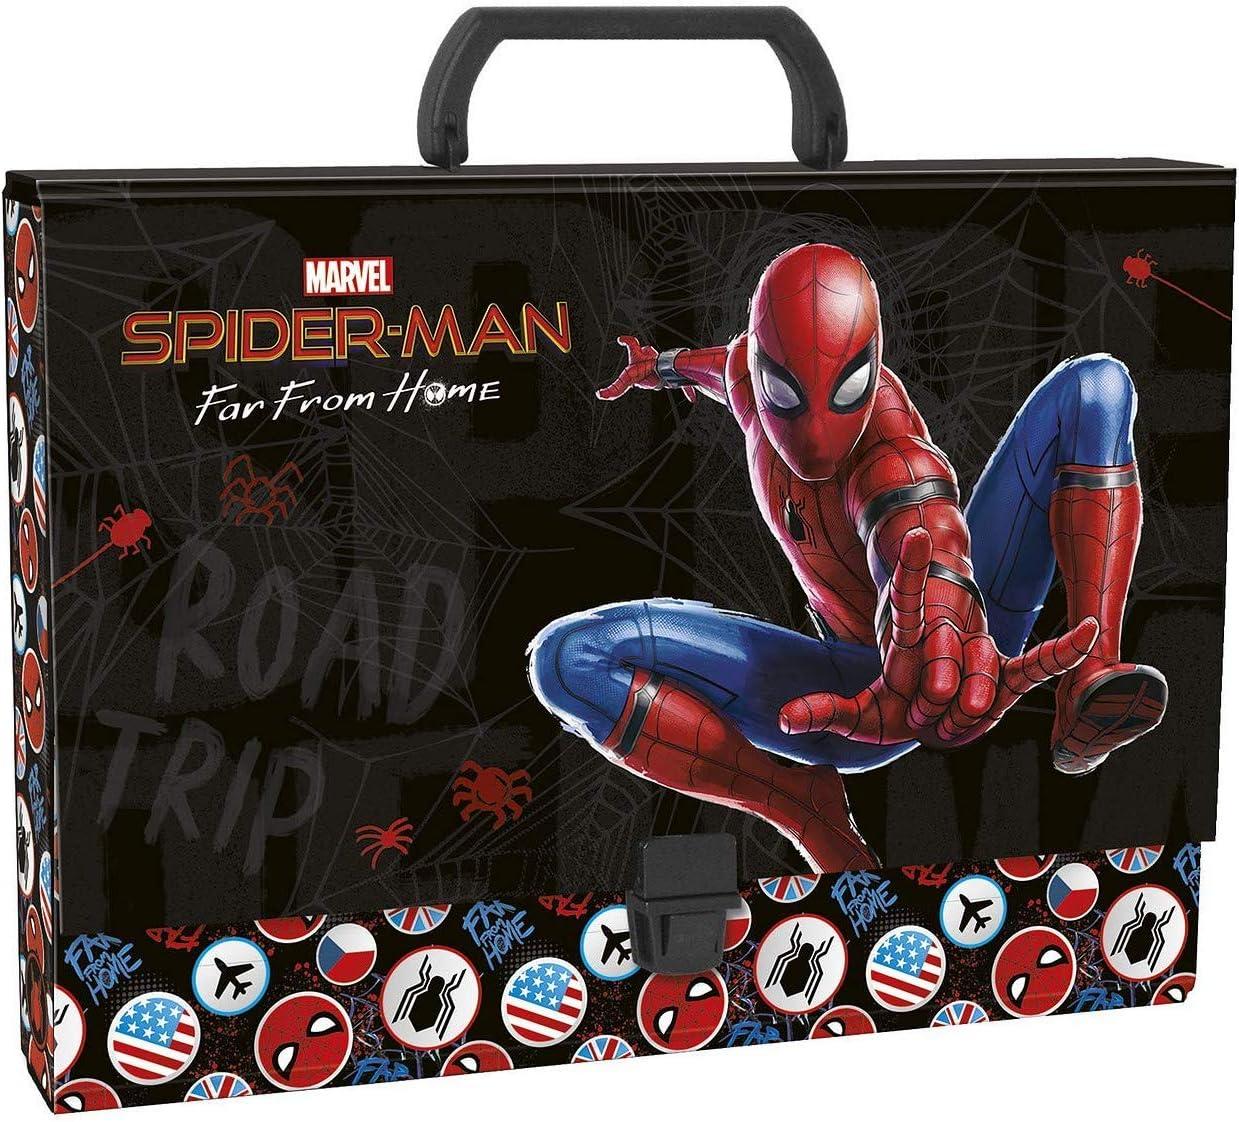 SPIDERMANN Turnbeutel école sport spider-man Chaussure Sac Garçons Sport sachet